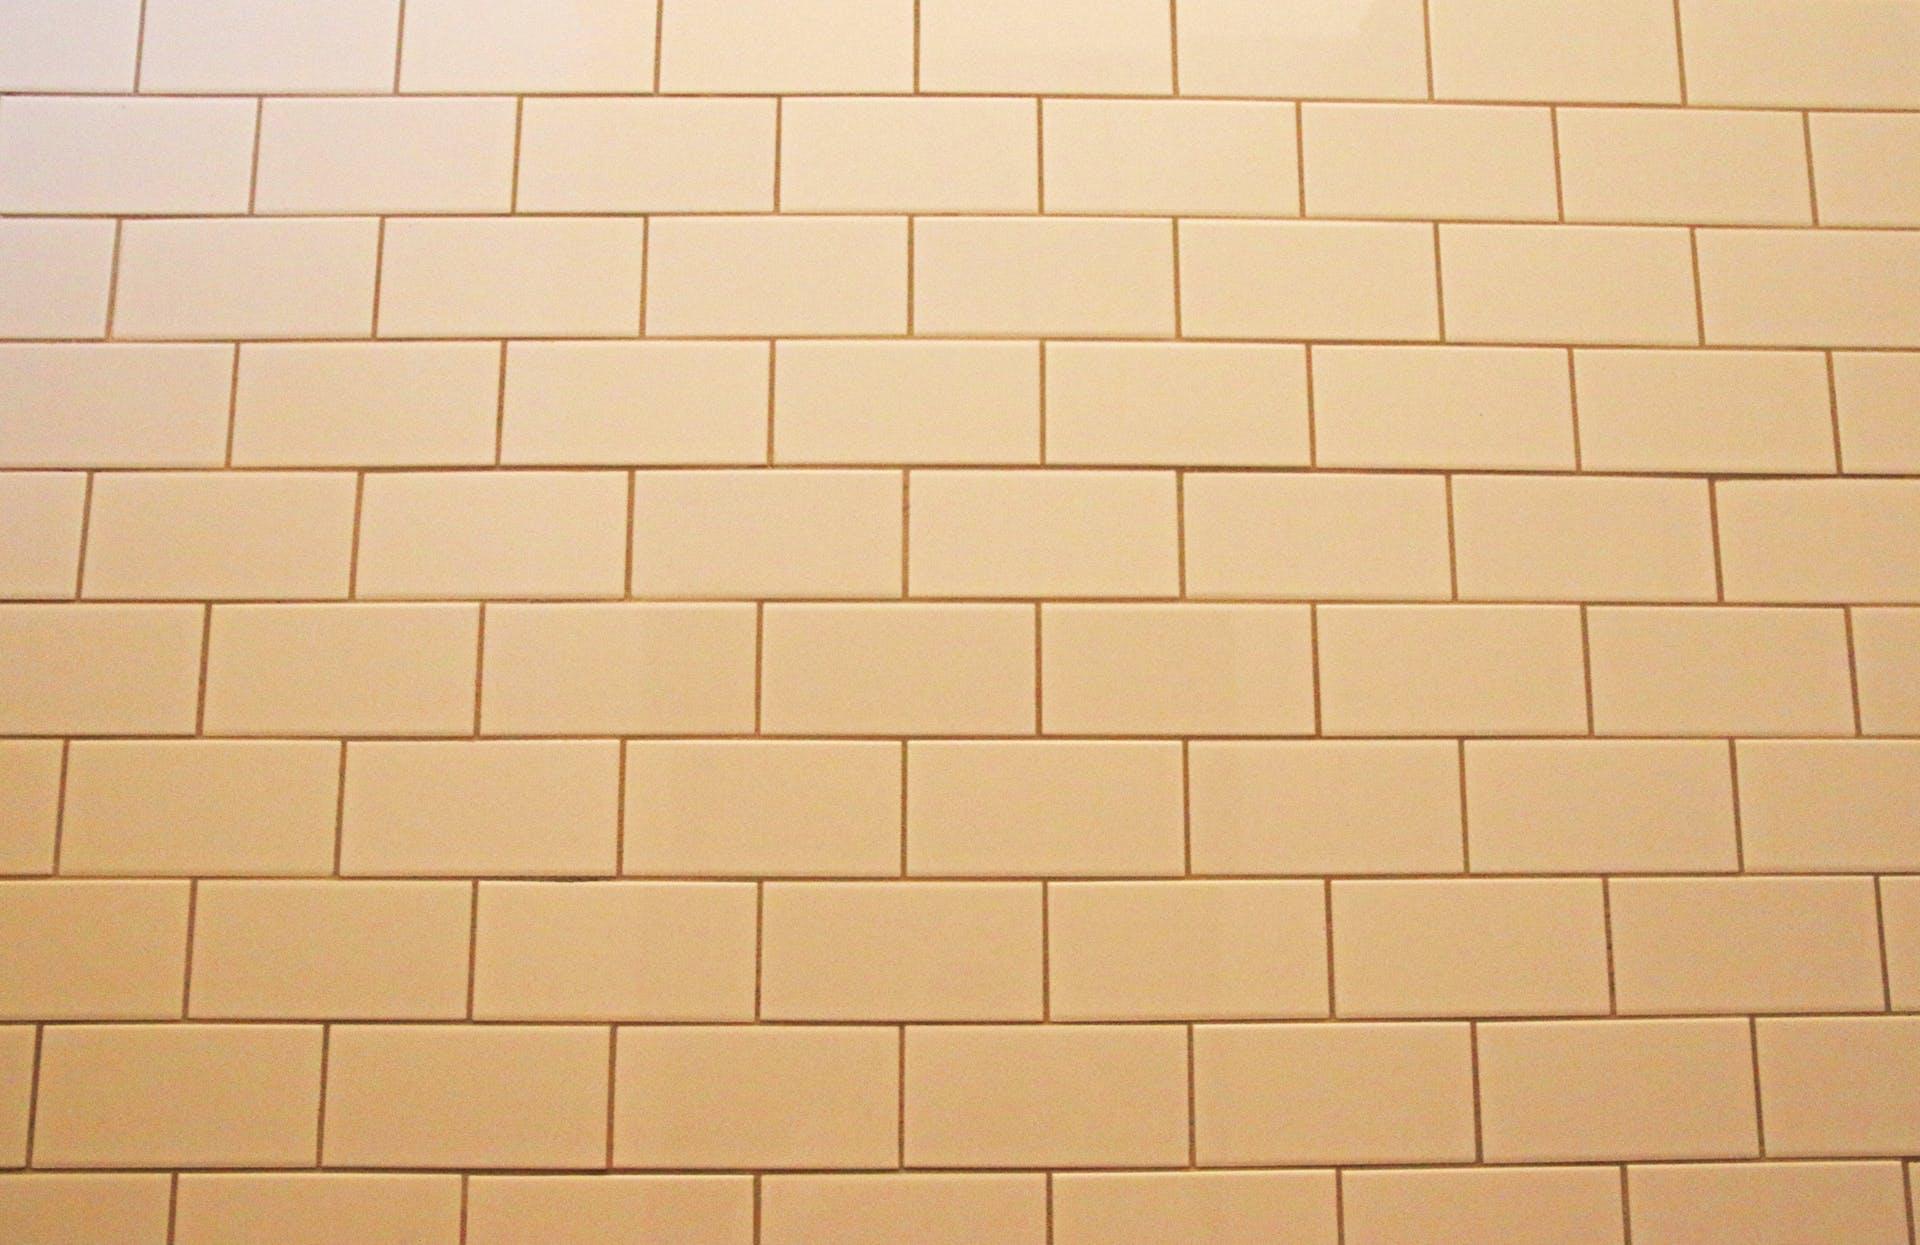 bricks blocks texture tiles white background